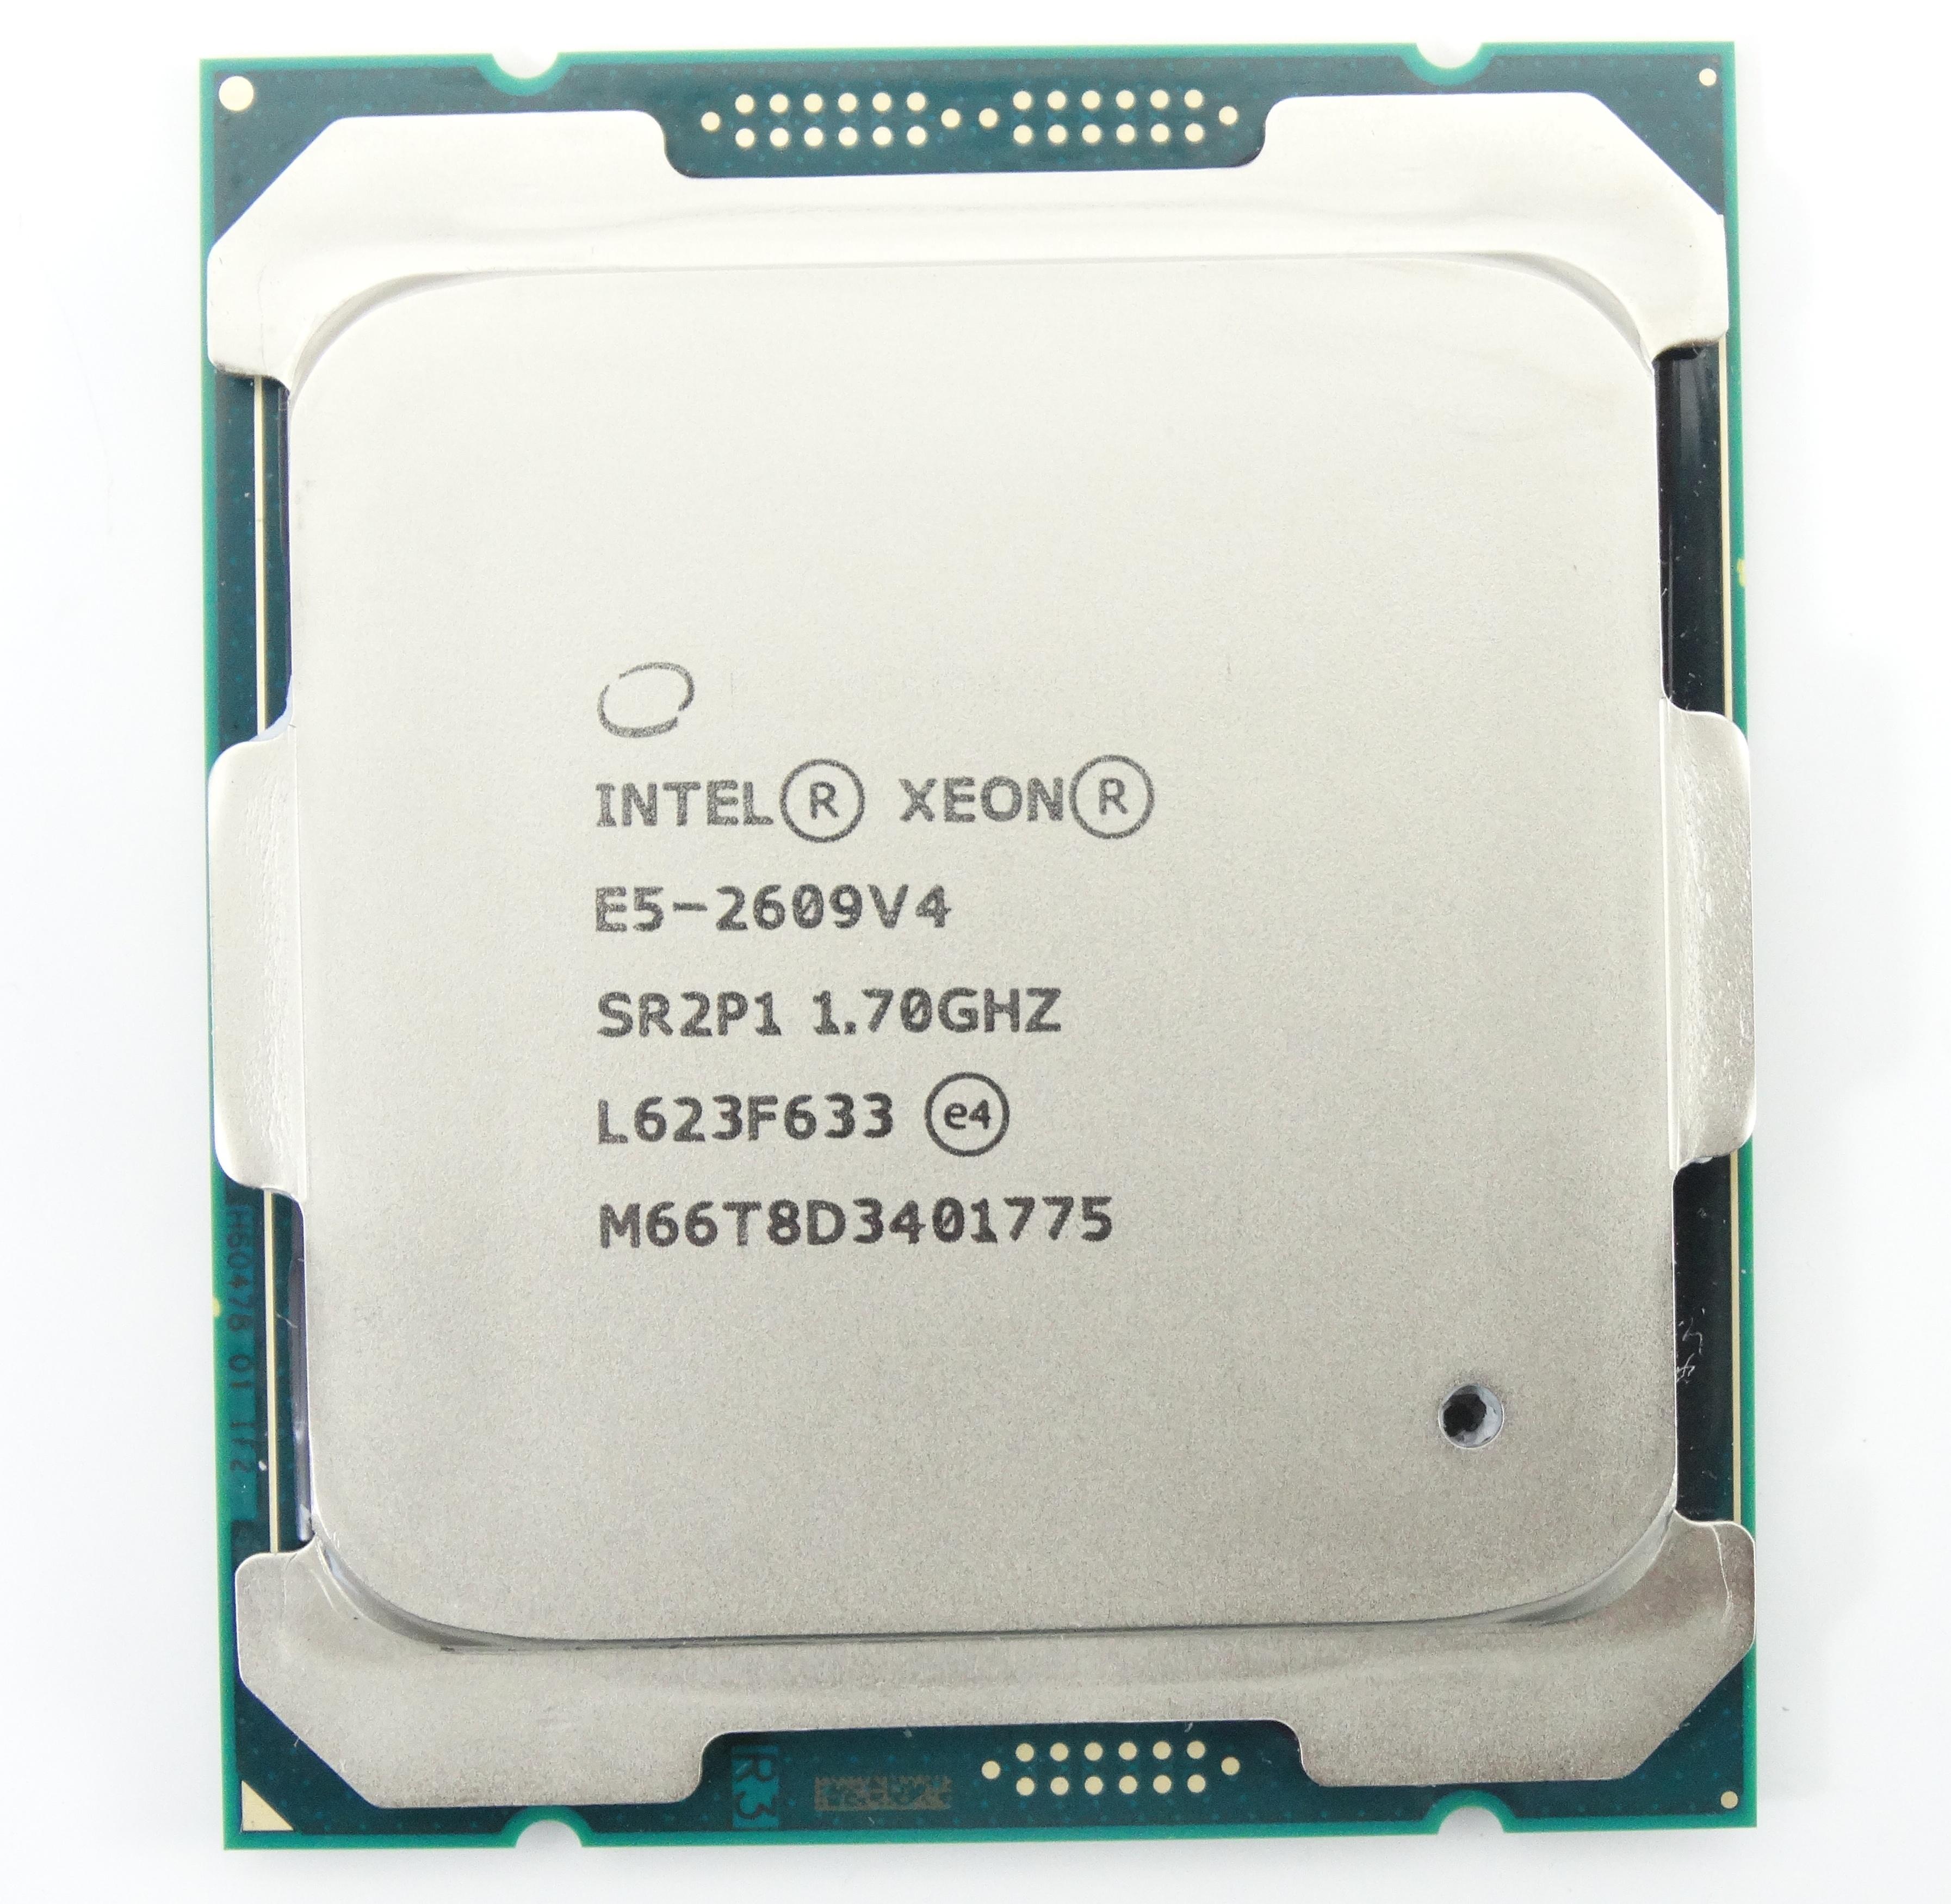 INTEL XEON E5-2609 V4 1.70GHZ 8CORE 20MB LGA2011-3 PROCESSOR (SR2P1)